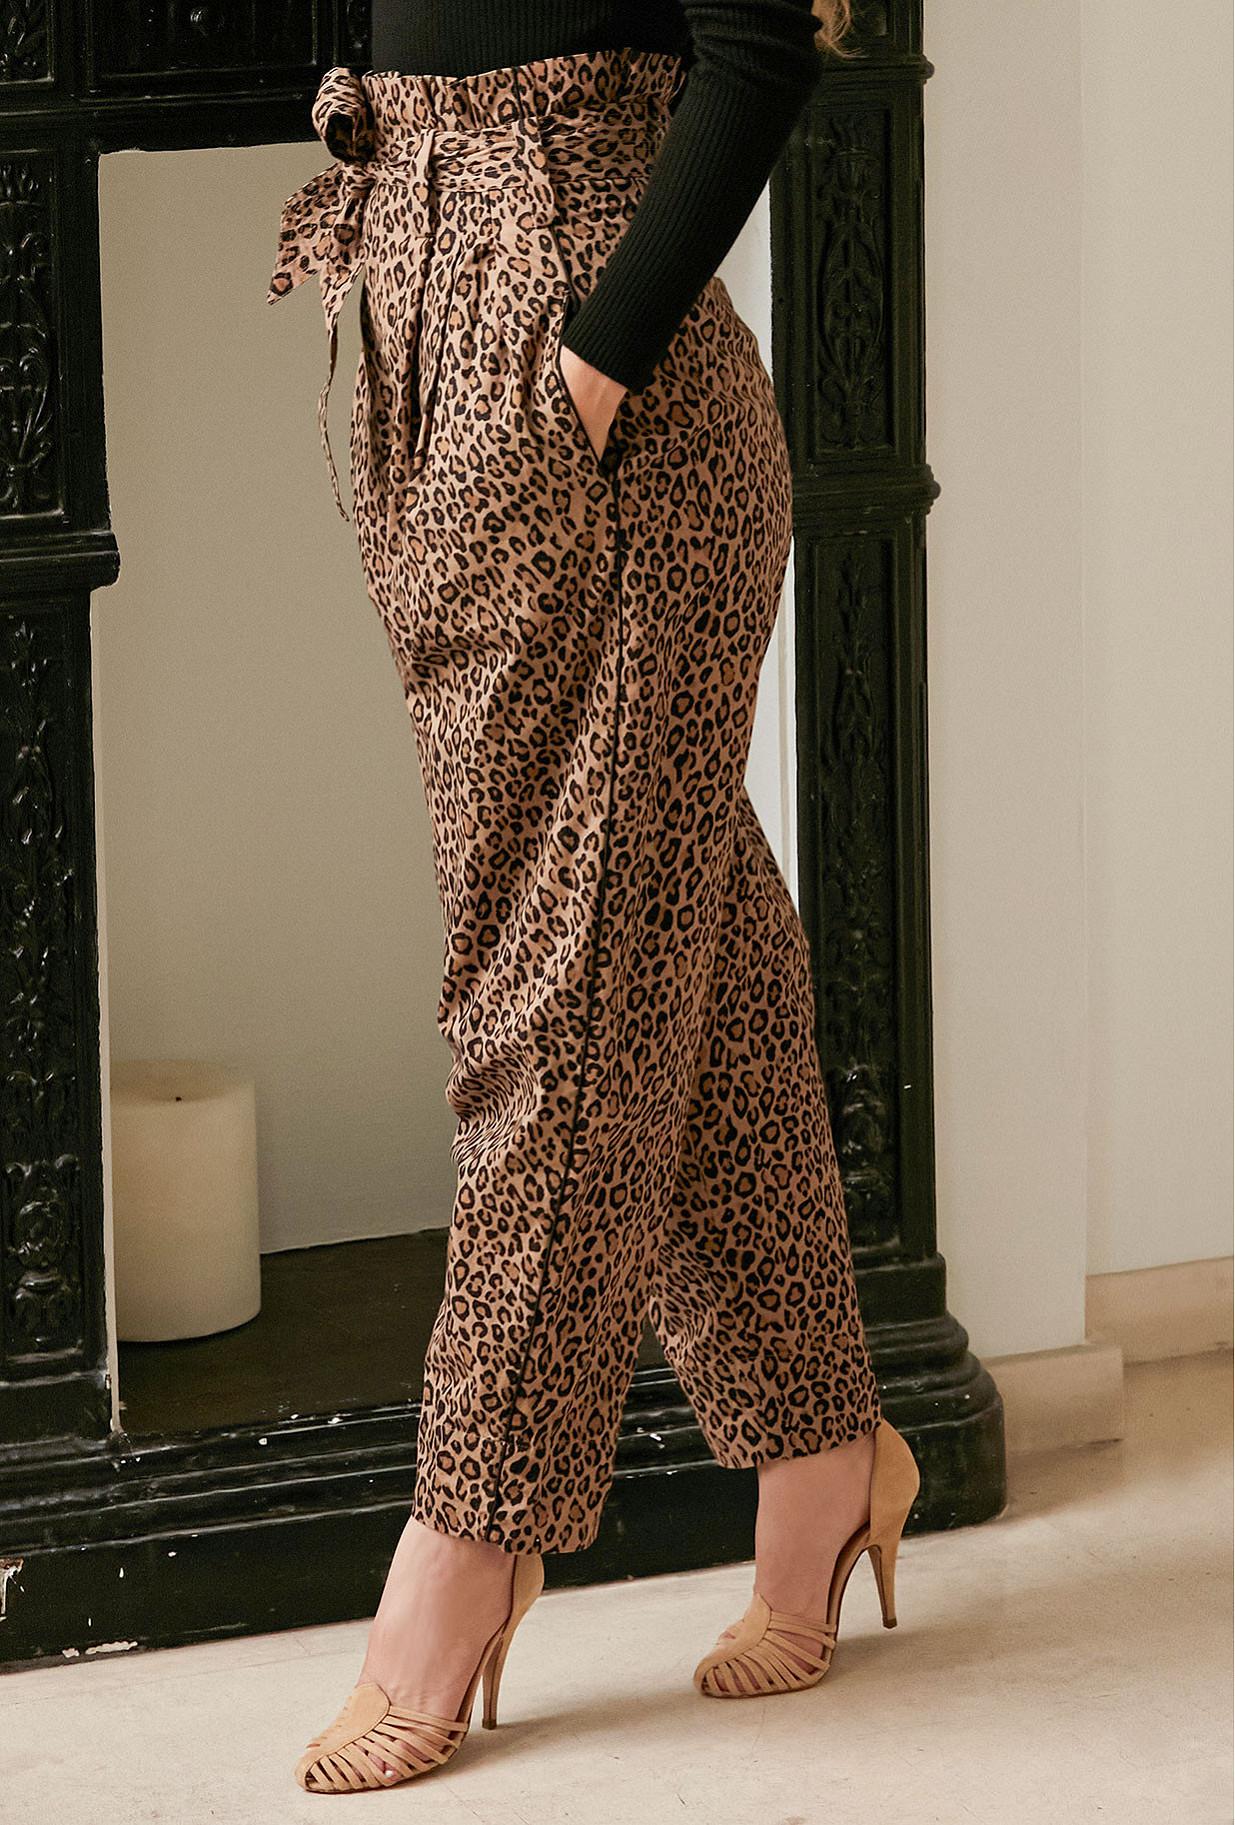 - Panther print - Pants Cheryl Mes Demoiselles Paris